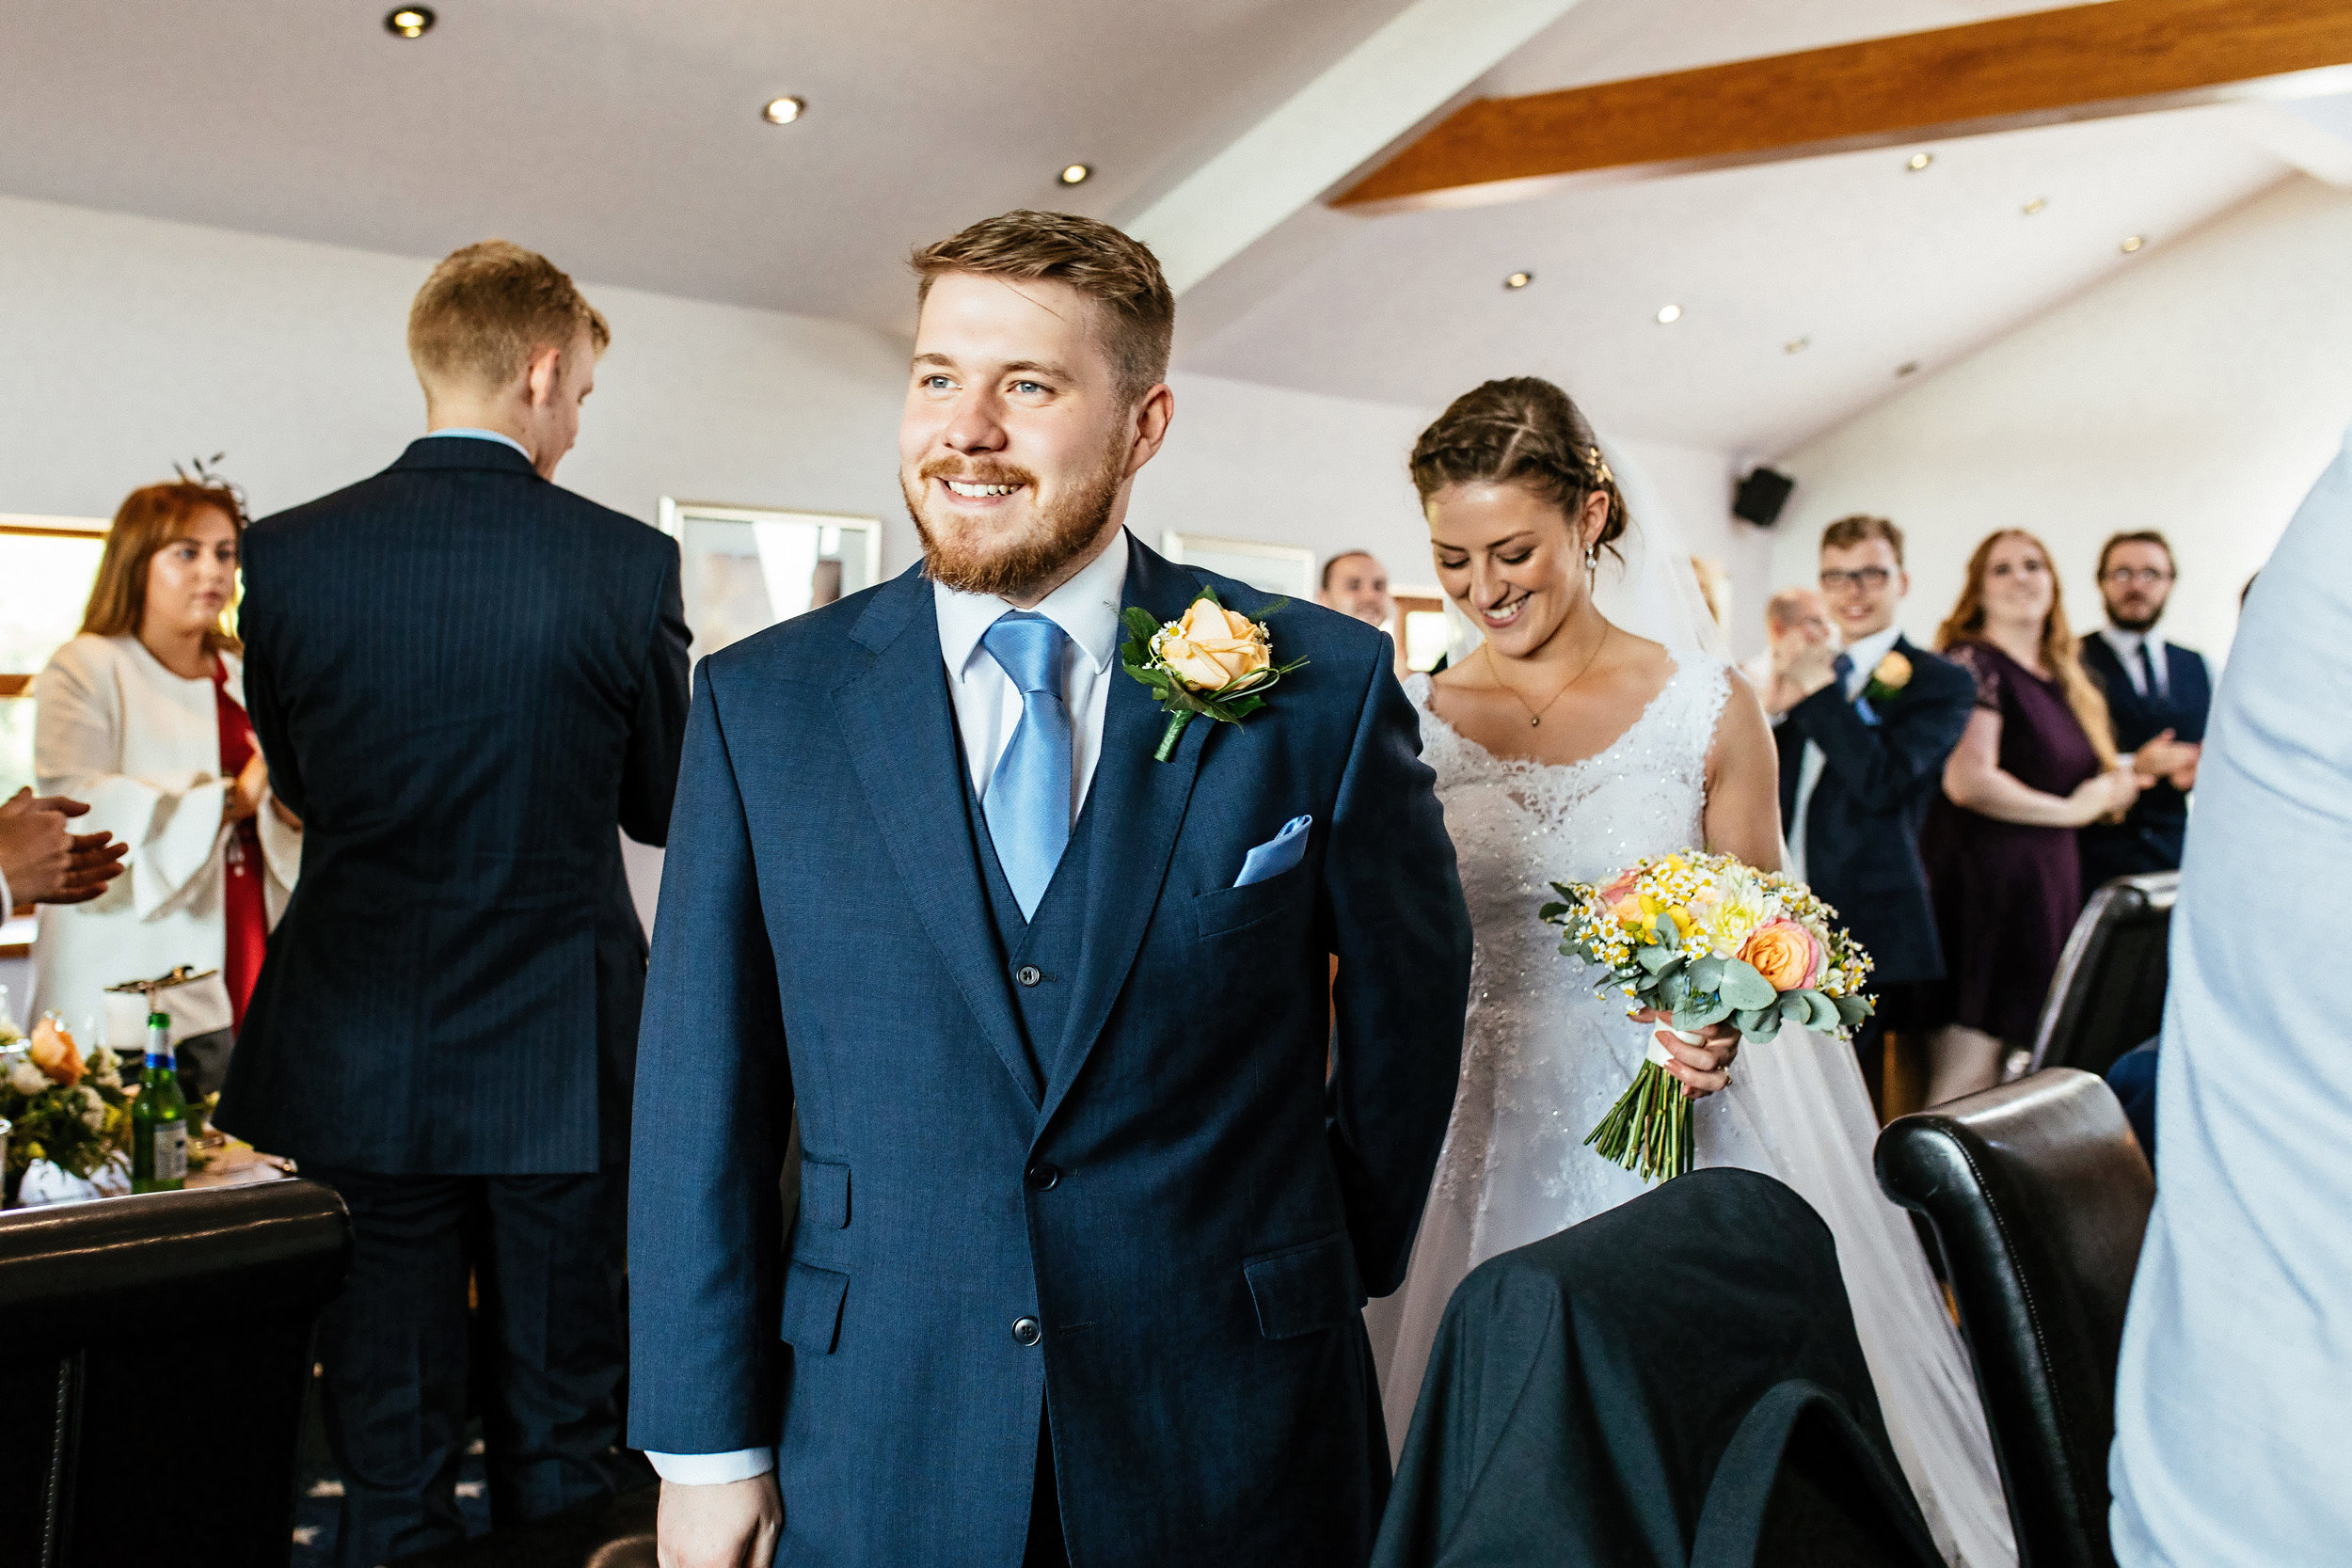 Kathryn-and-Mike-Wedding-Highlights-74.jpg